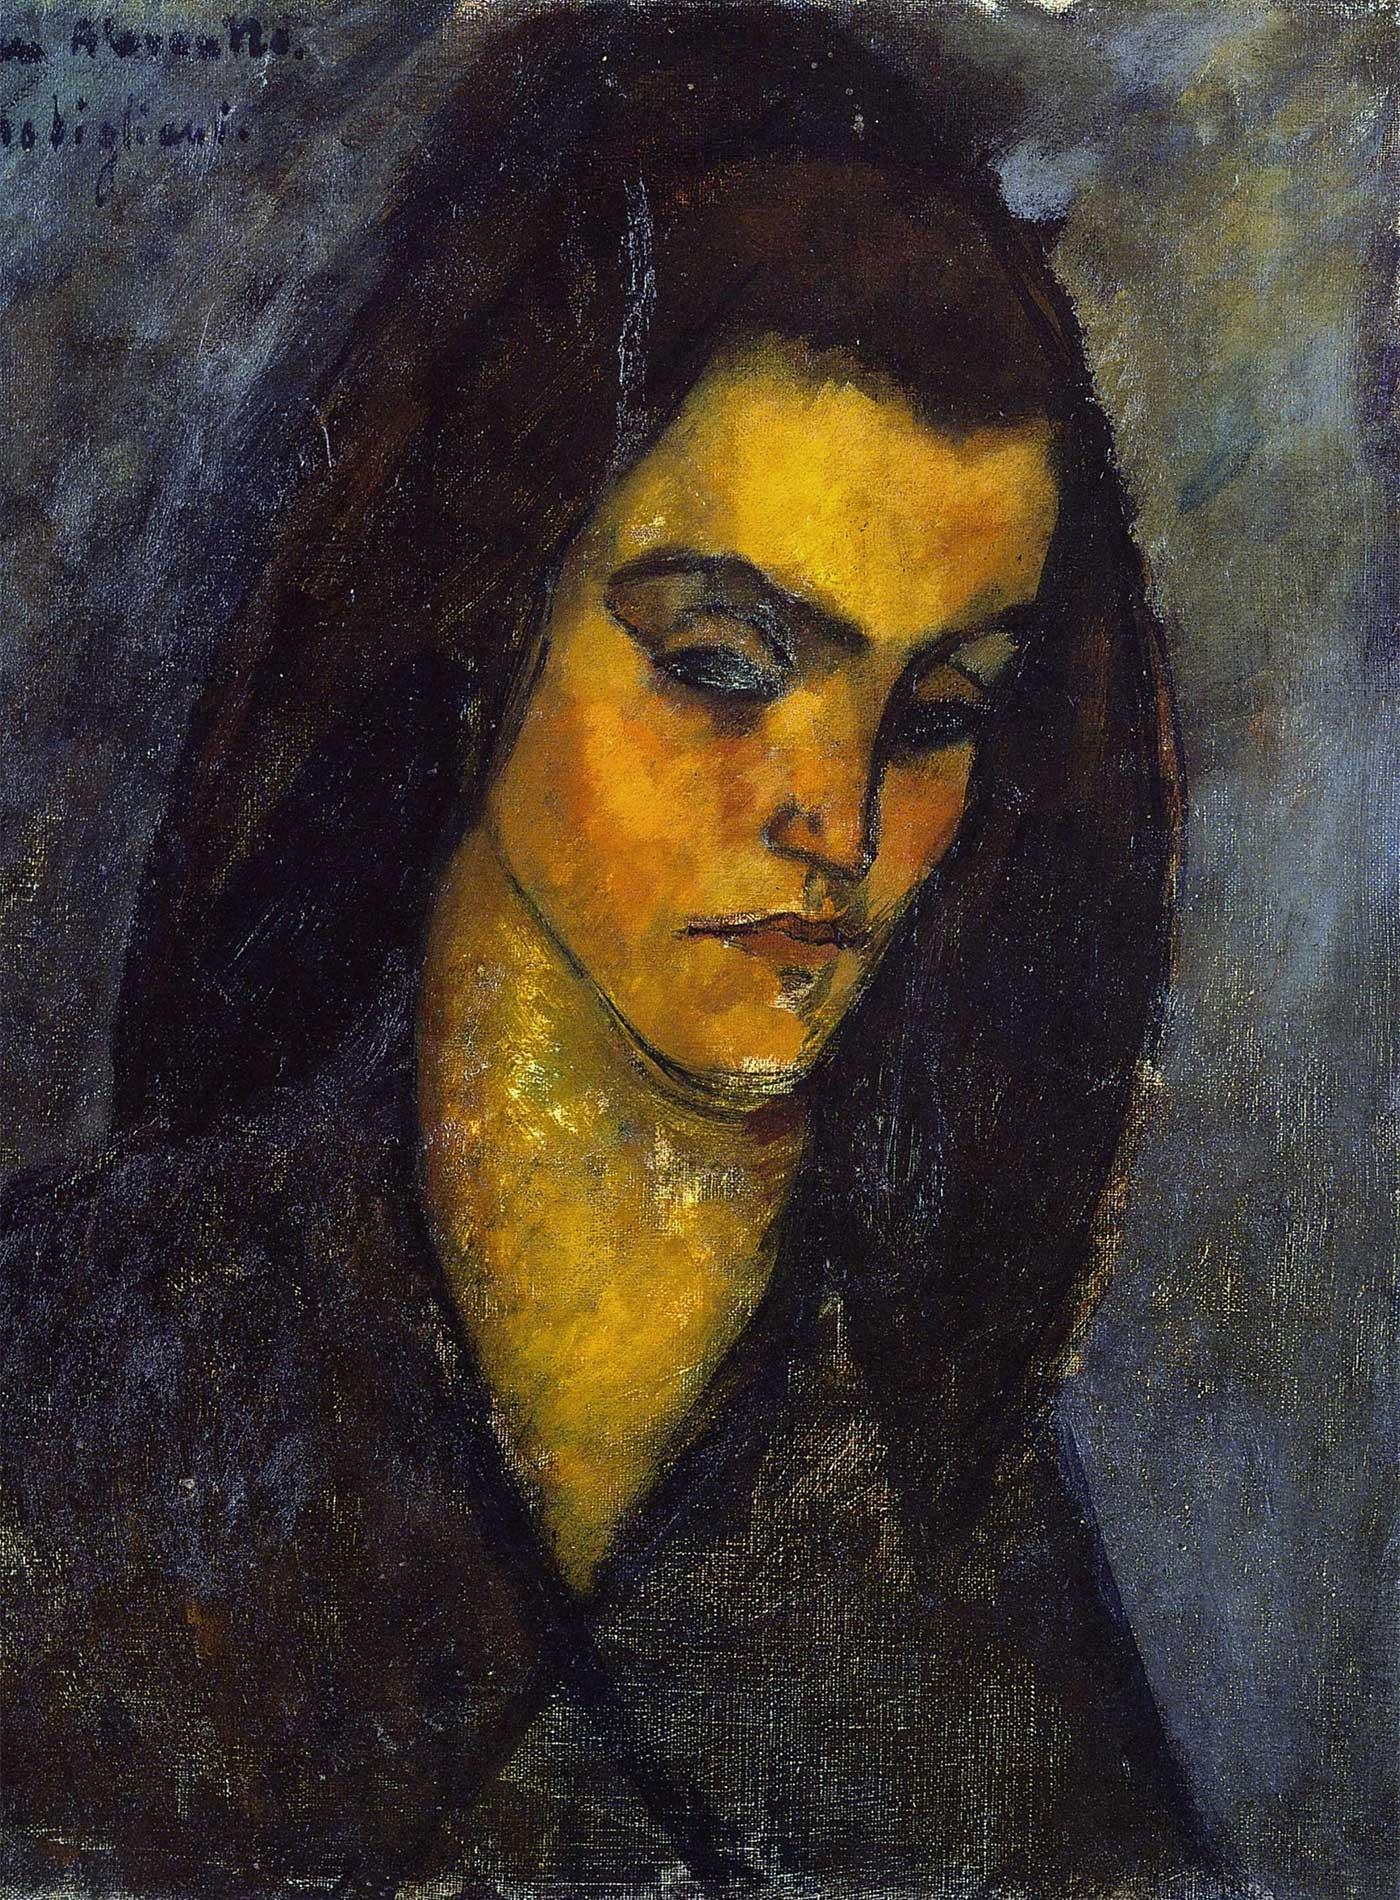 La mendicante (La méndiant) – Olio su tela, 46 x 37,5 cm